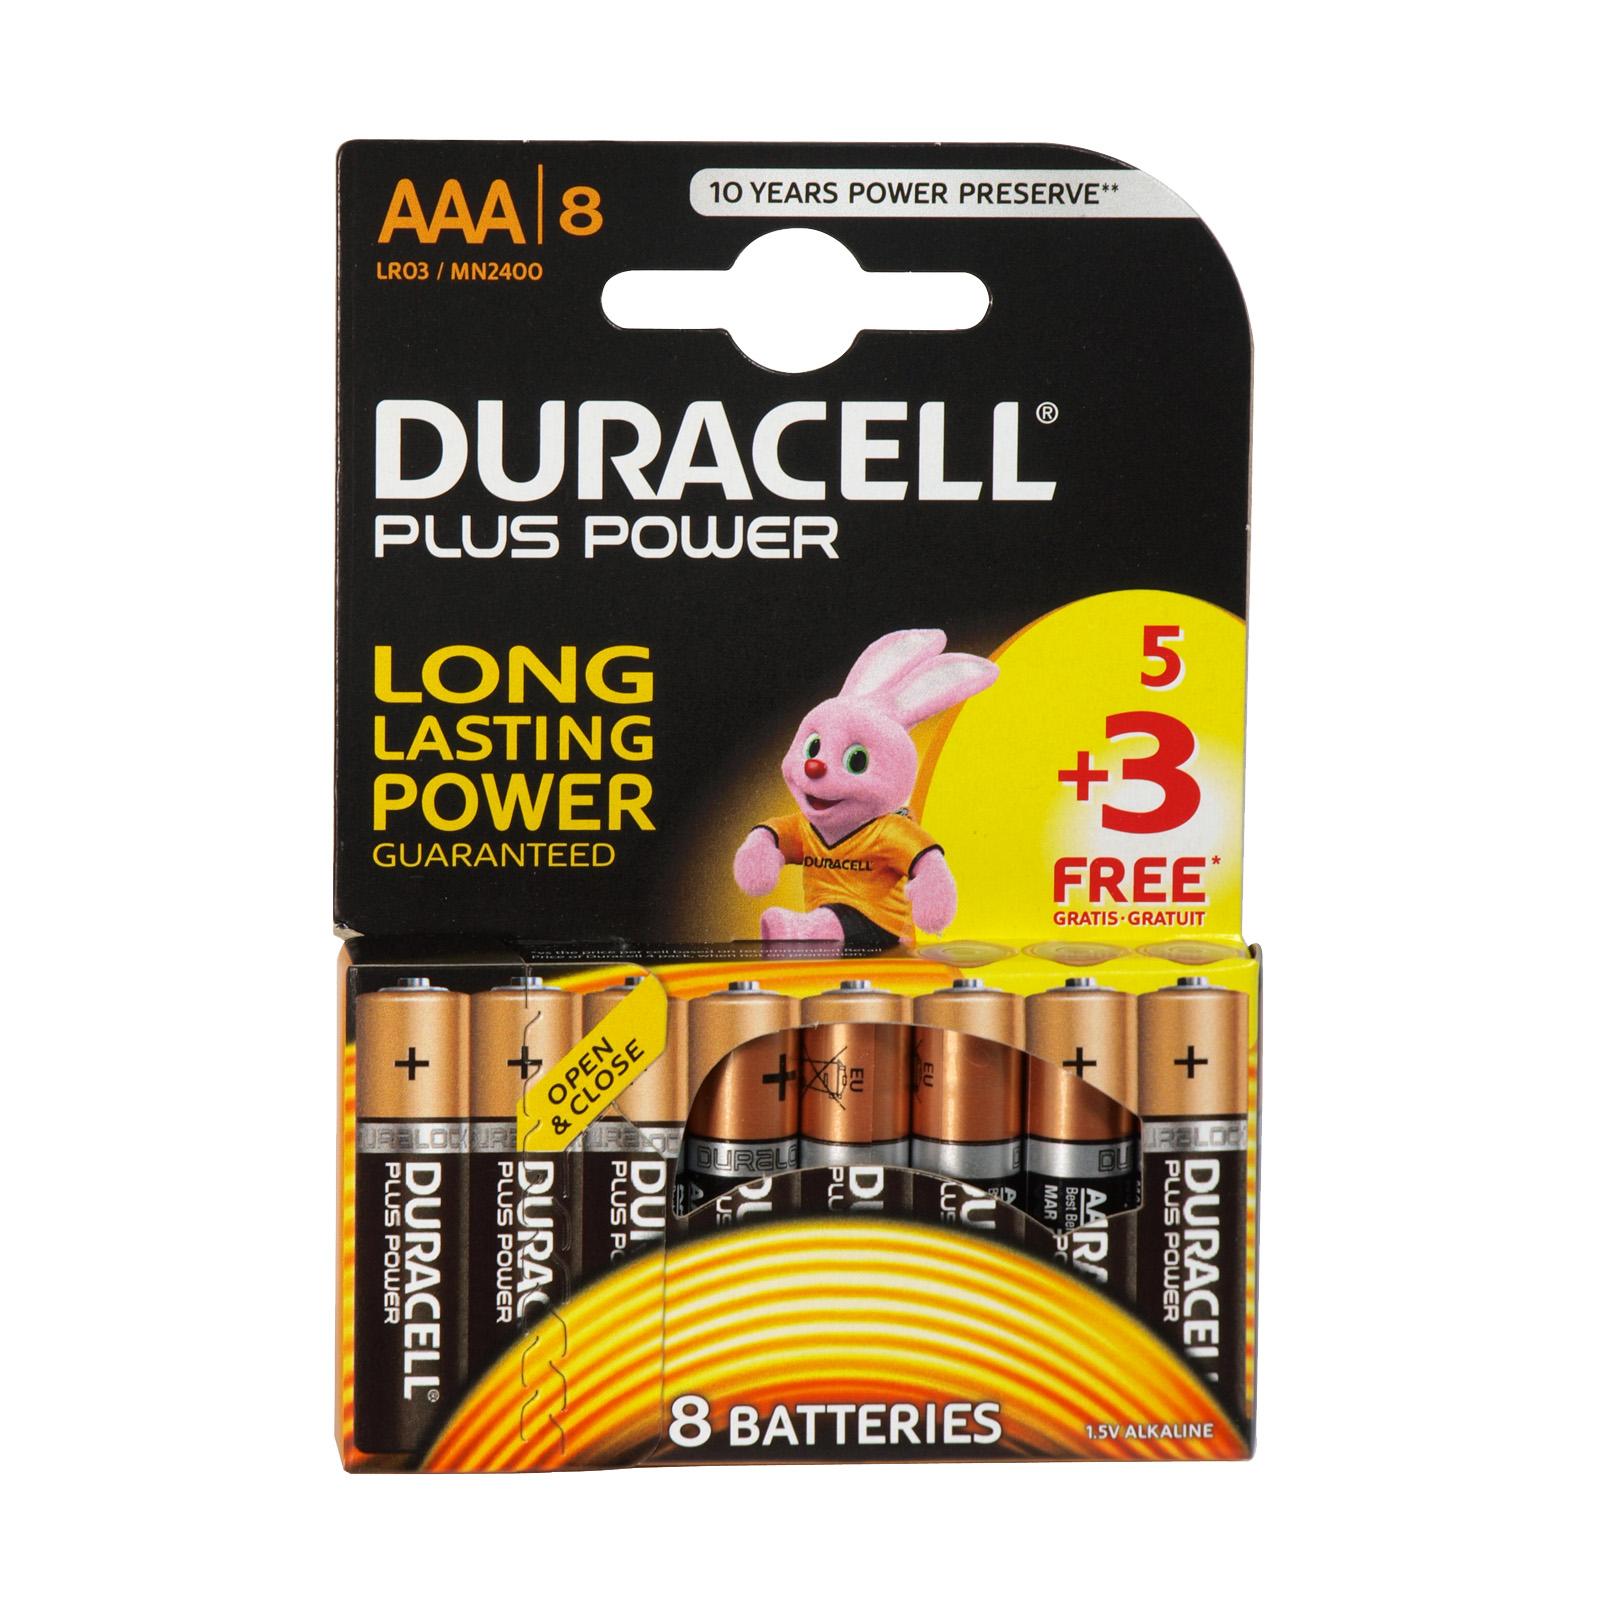 DURACELL PLUS POWER 5+3 FOC AAA